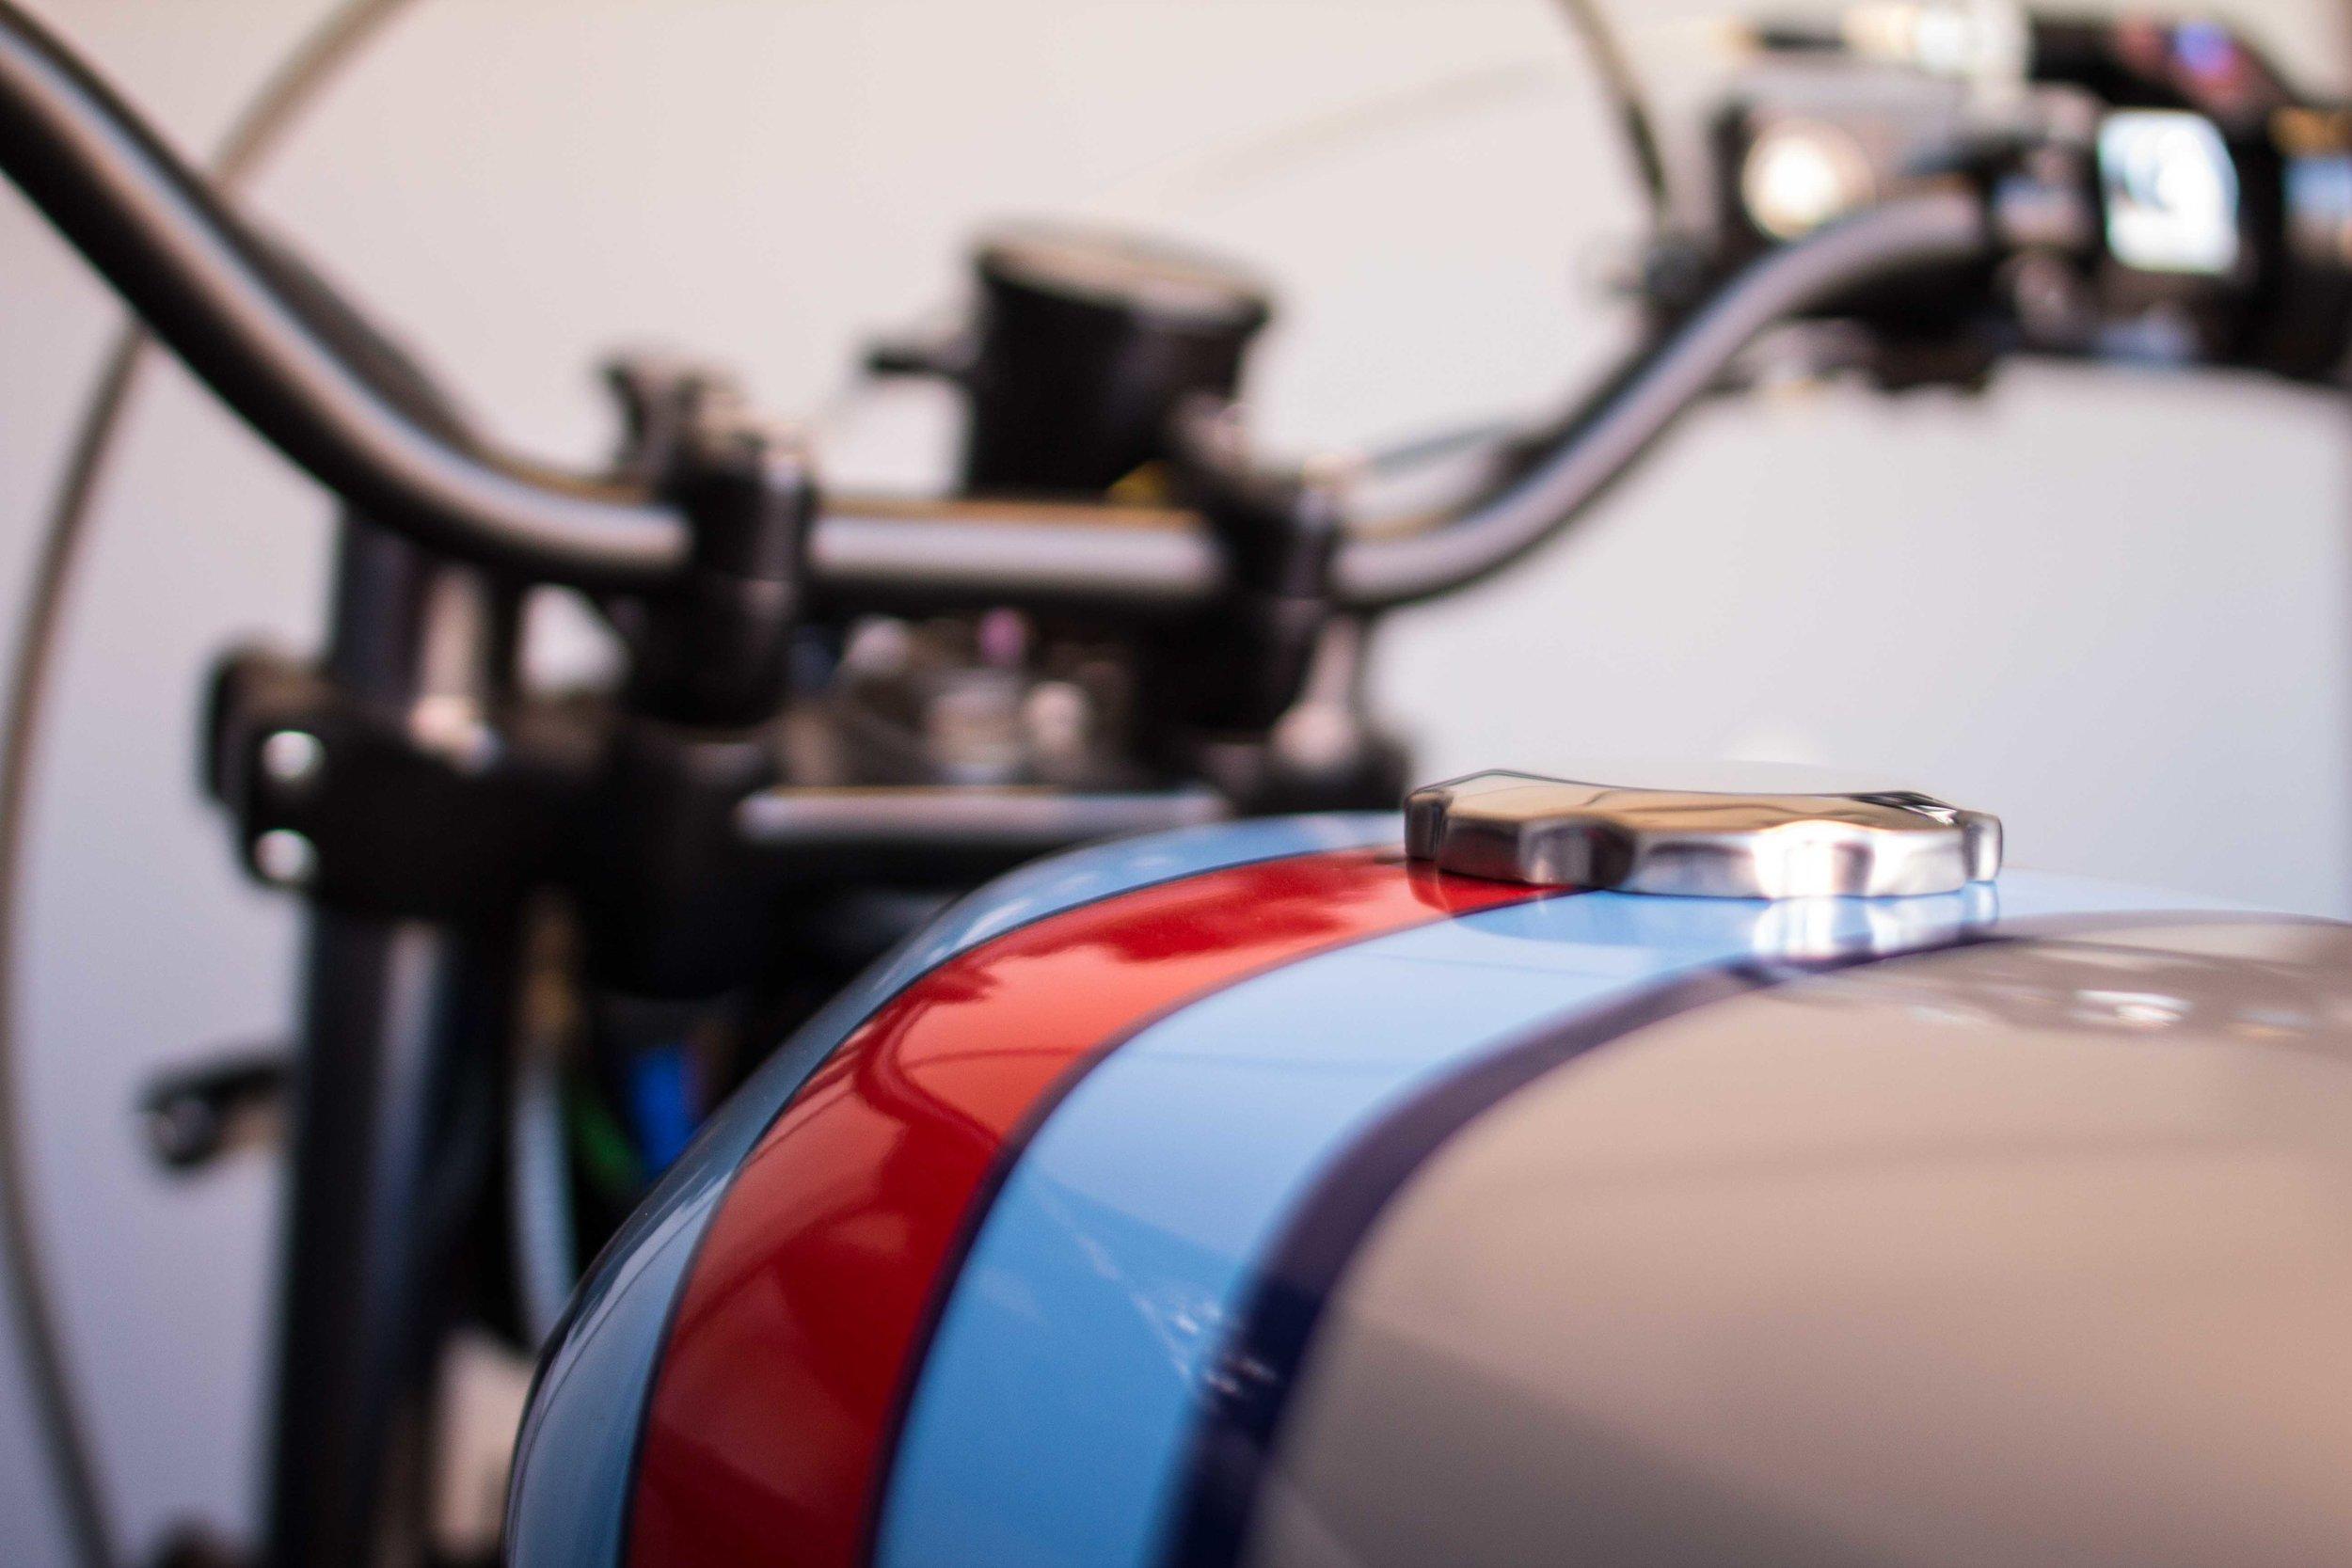 elet motor parts (1 of 1)-19.jpg